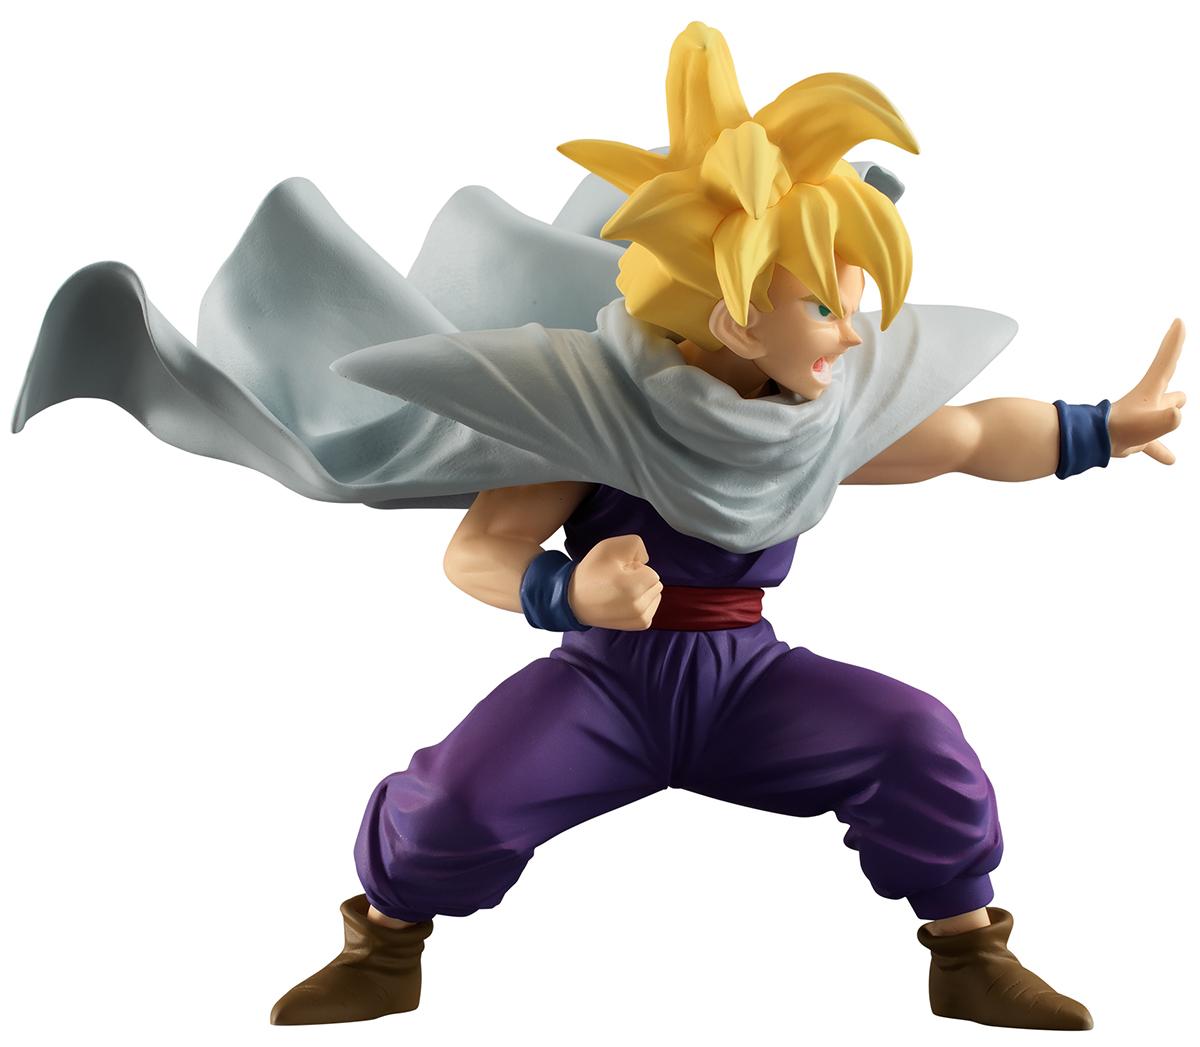 BandaiФигурка Dragon Ball Styling Son Gohan 9 см Bandai